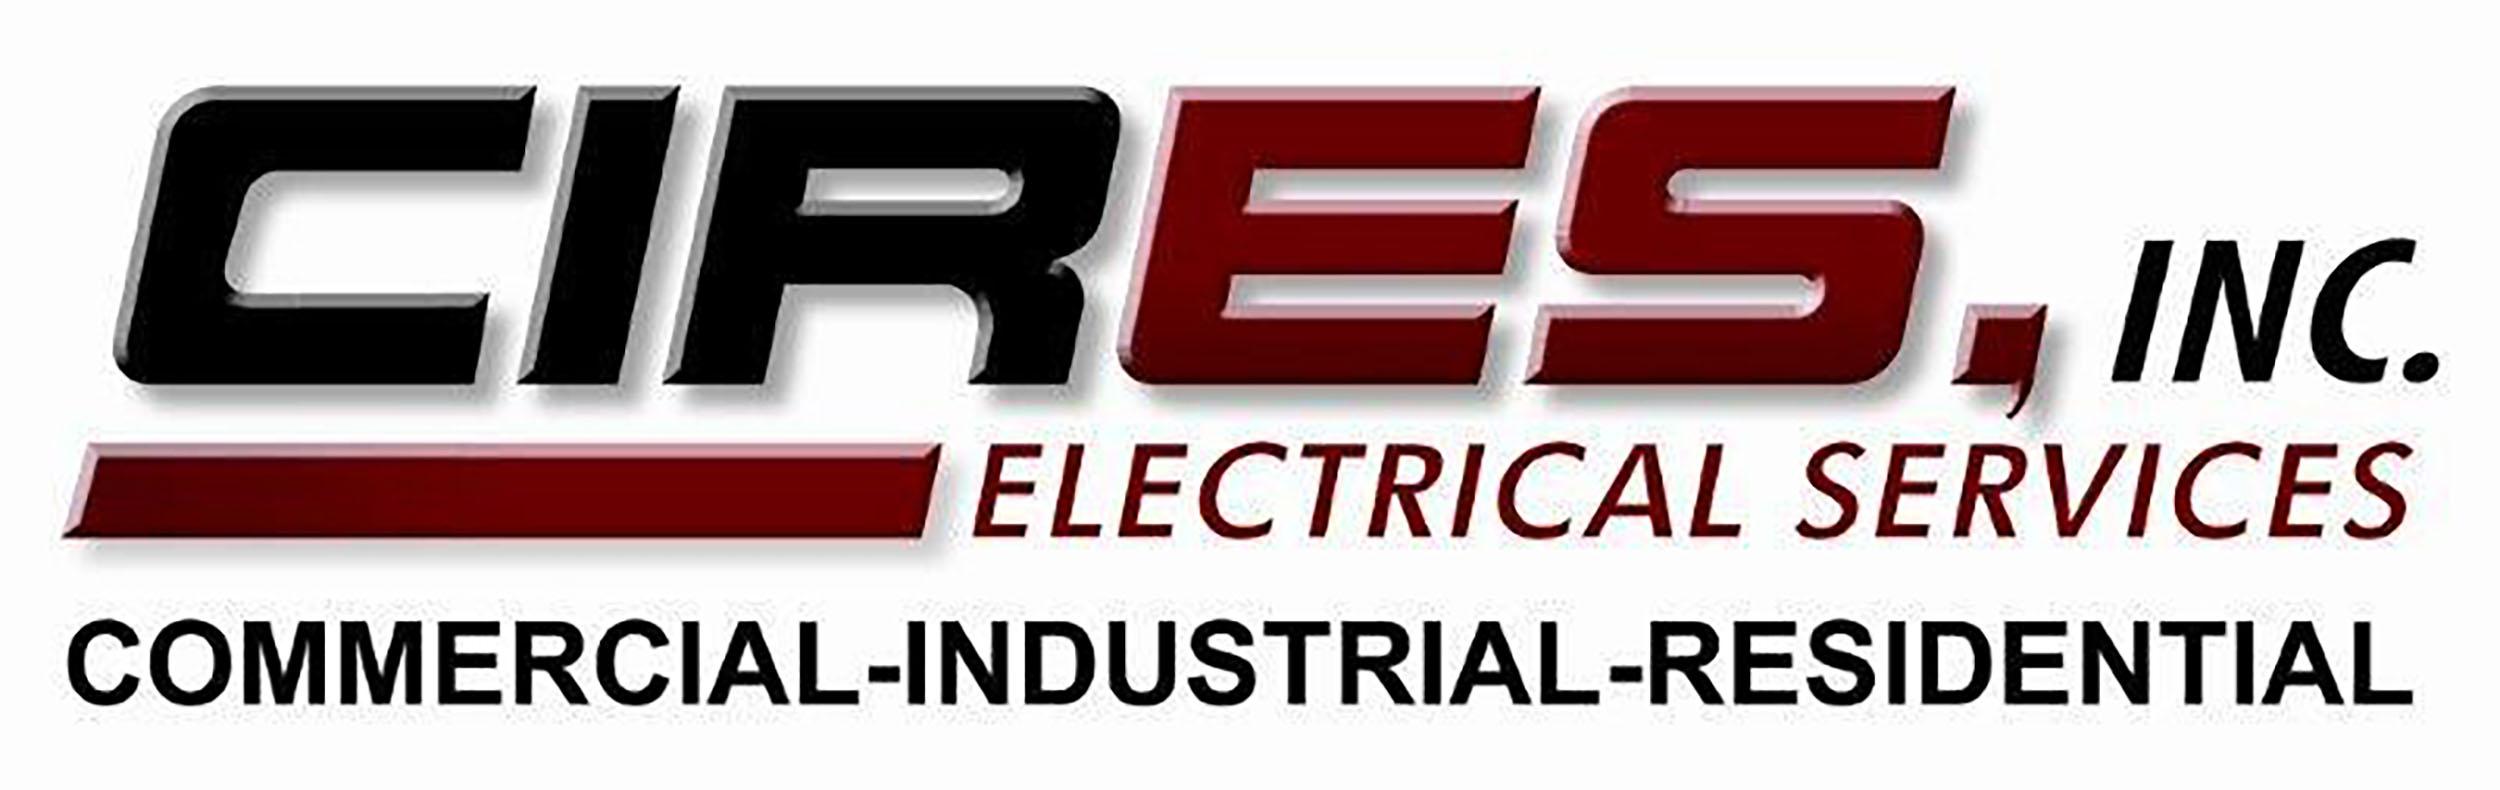 Cires Electric